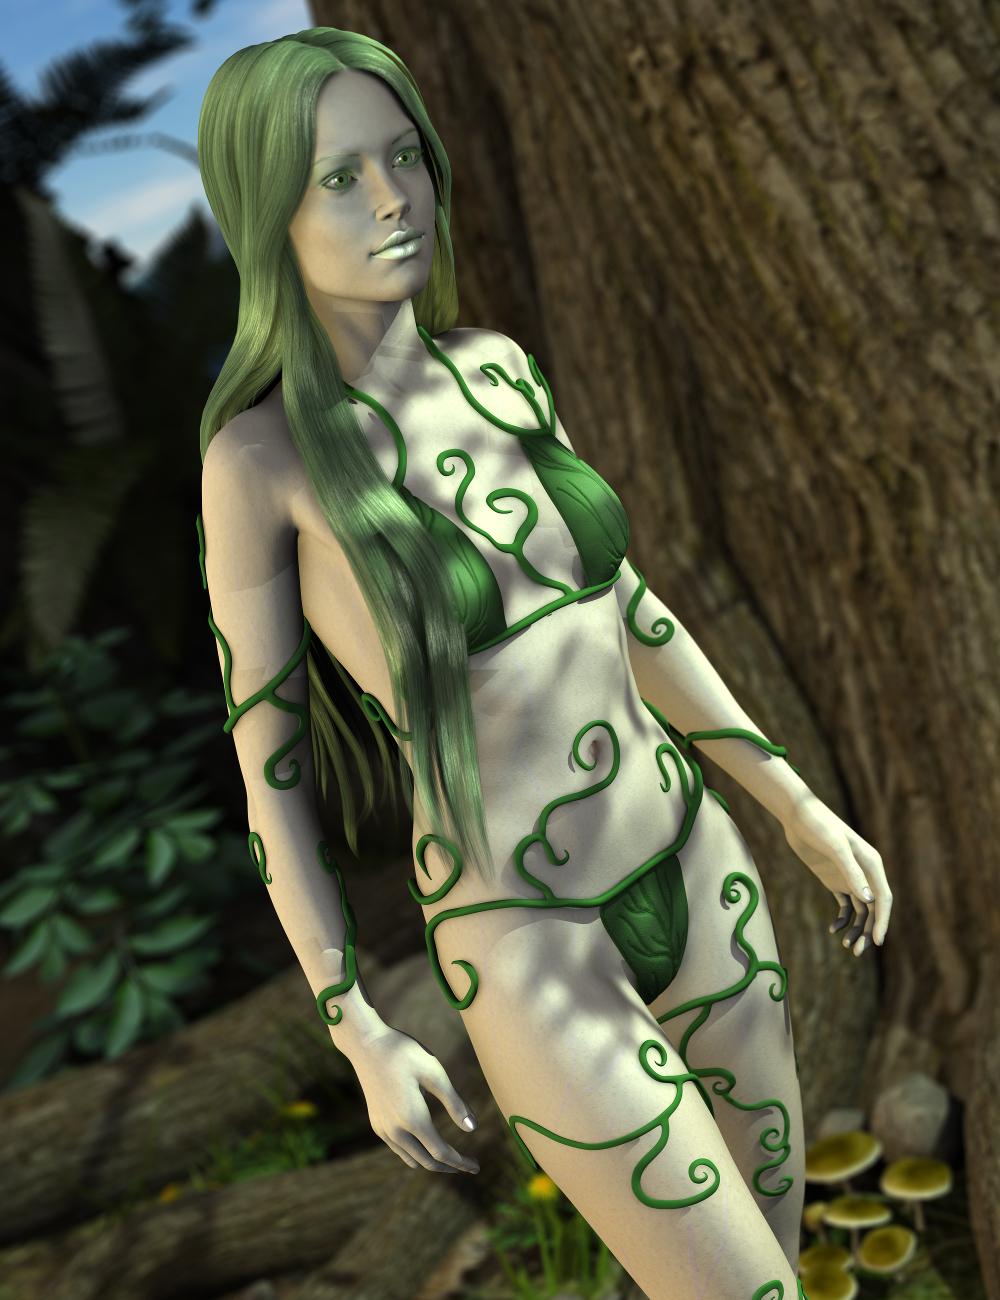 Slender Stephanie 6 by: Sickleyield, 3D Models by Daz 3D